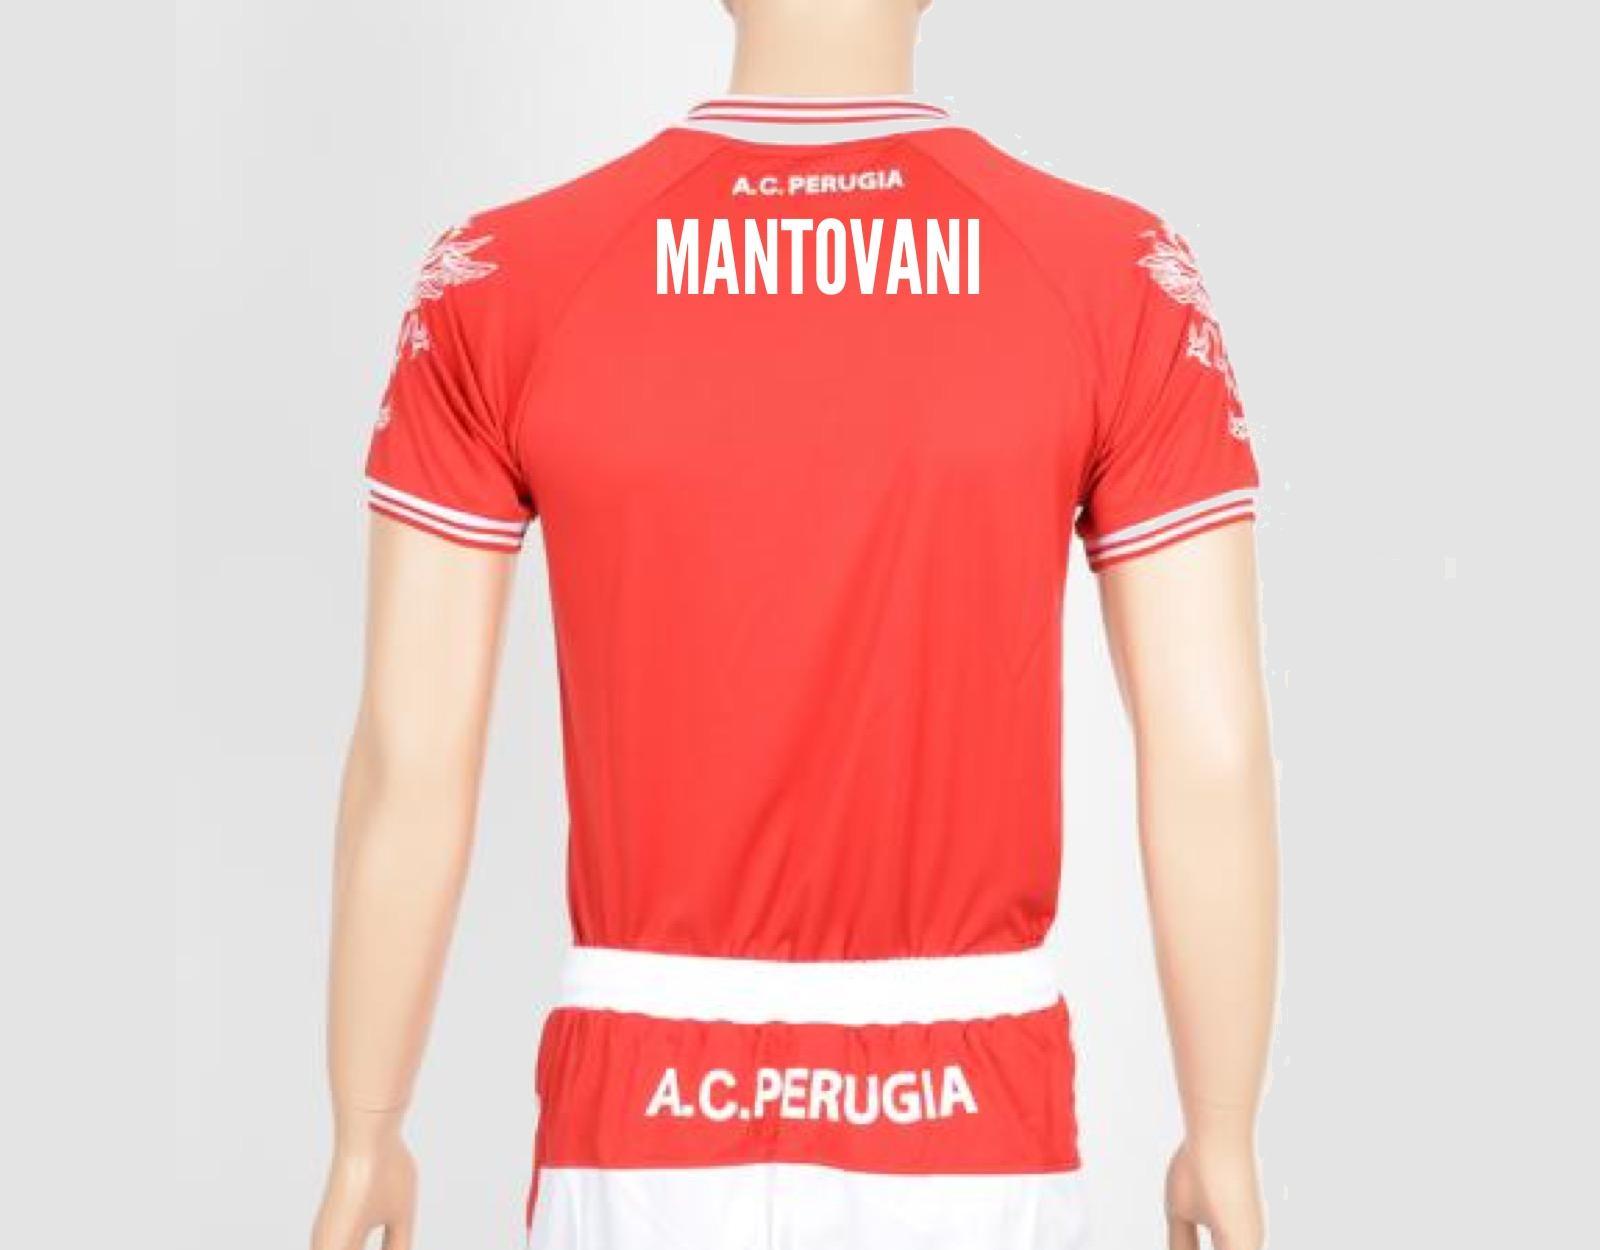 Mantovani_maglia